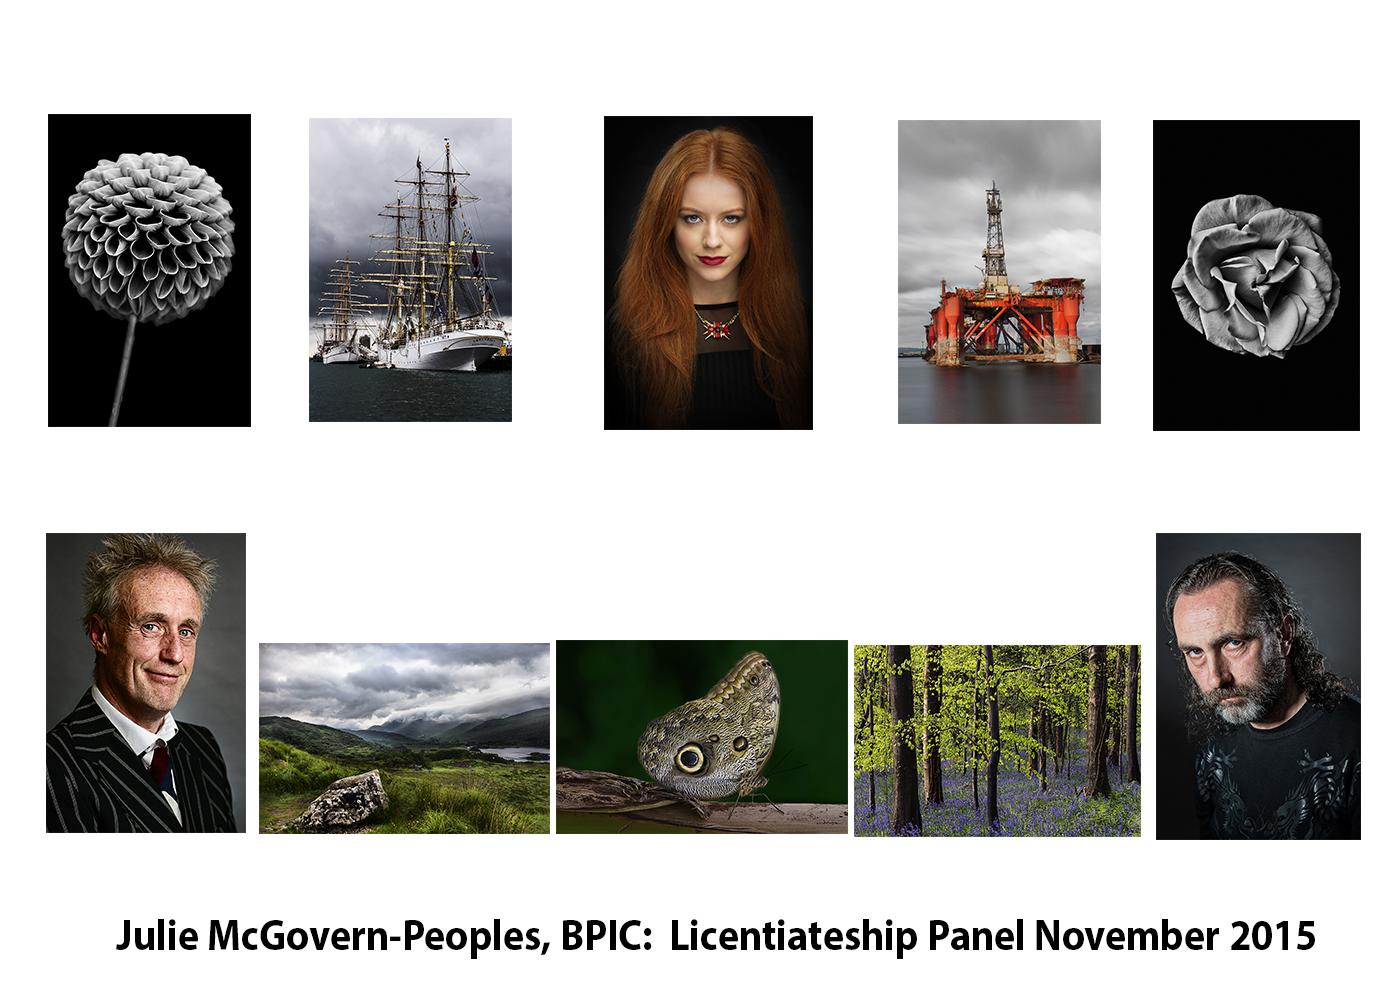 Julie McGovern-Peoples LIPF